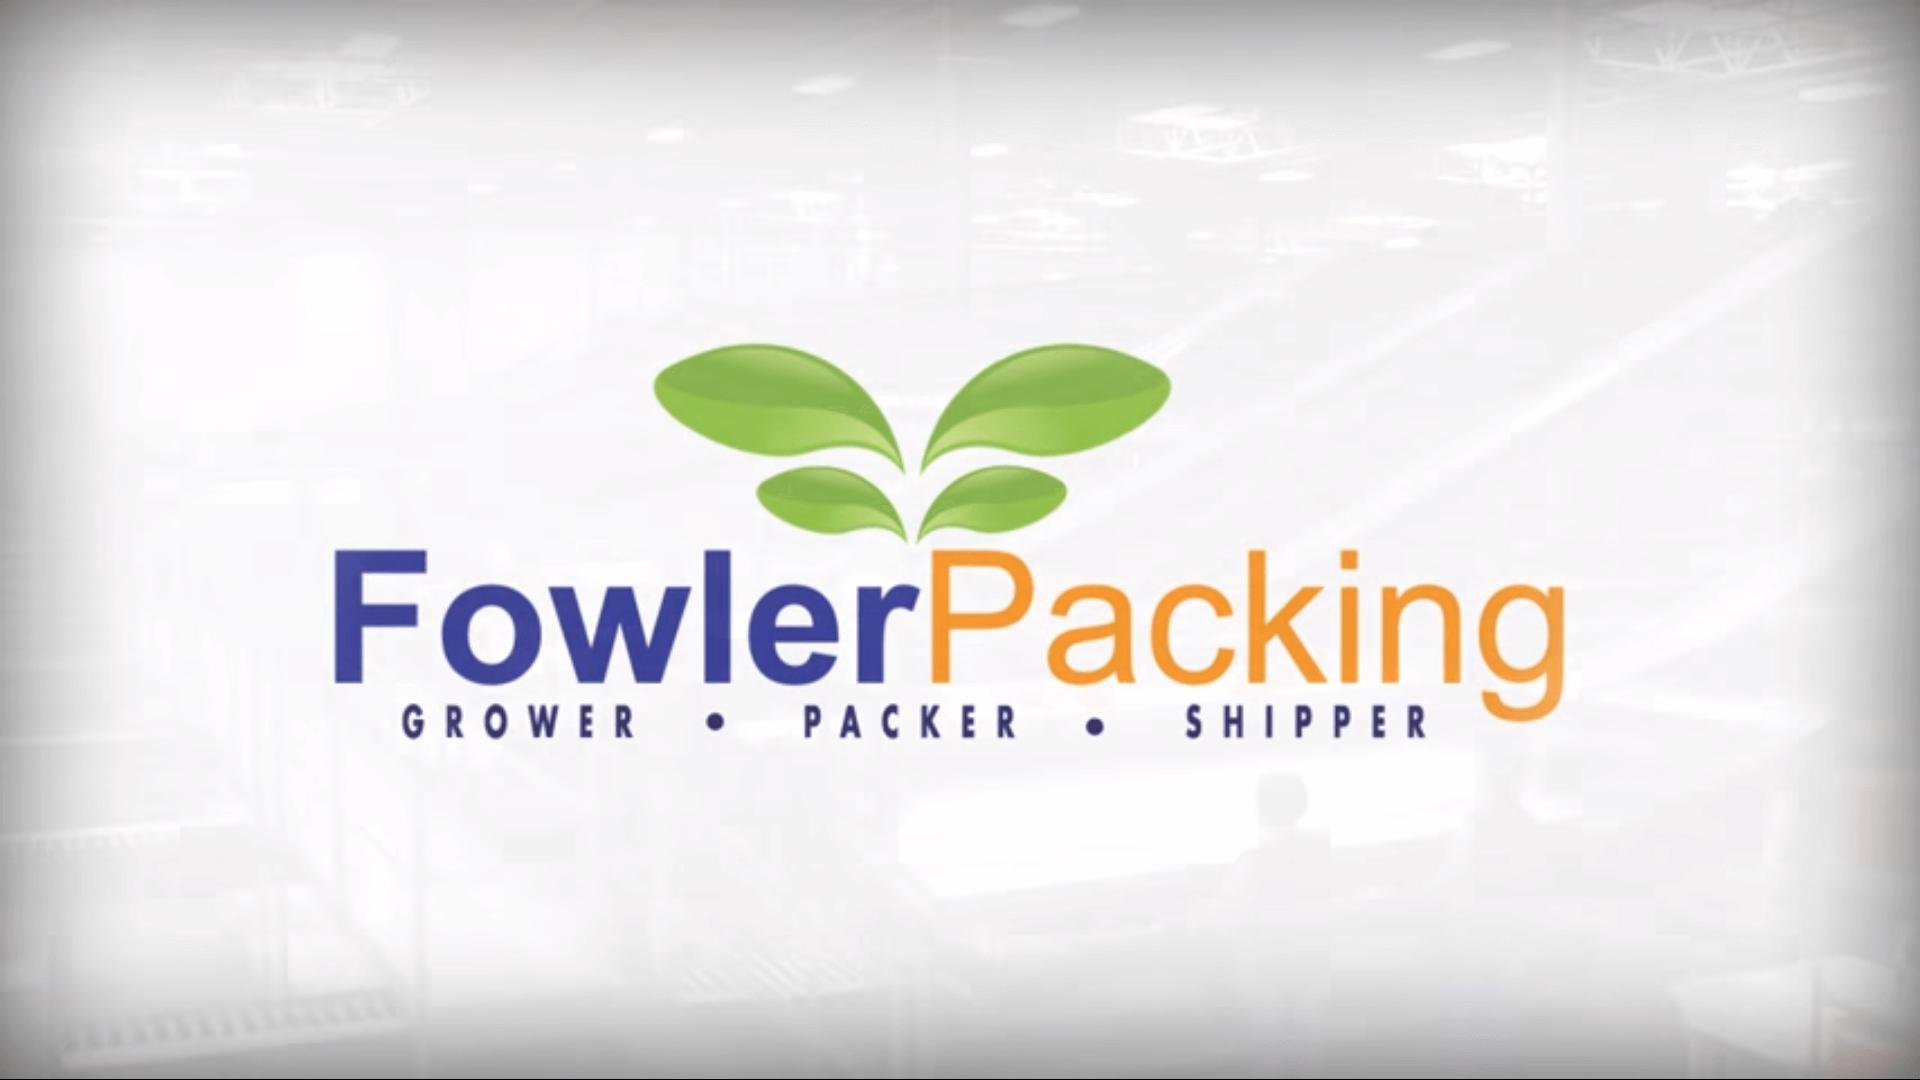 portfolio digital attic fowler packing video screenshot